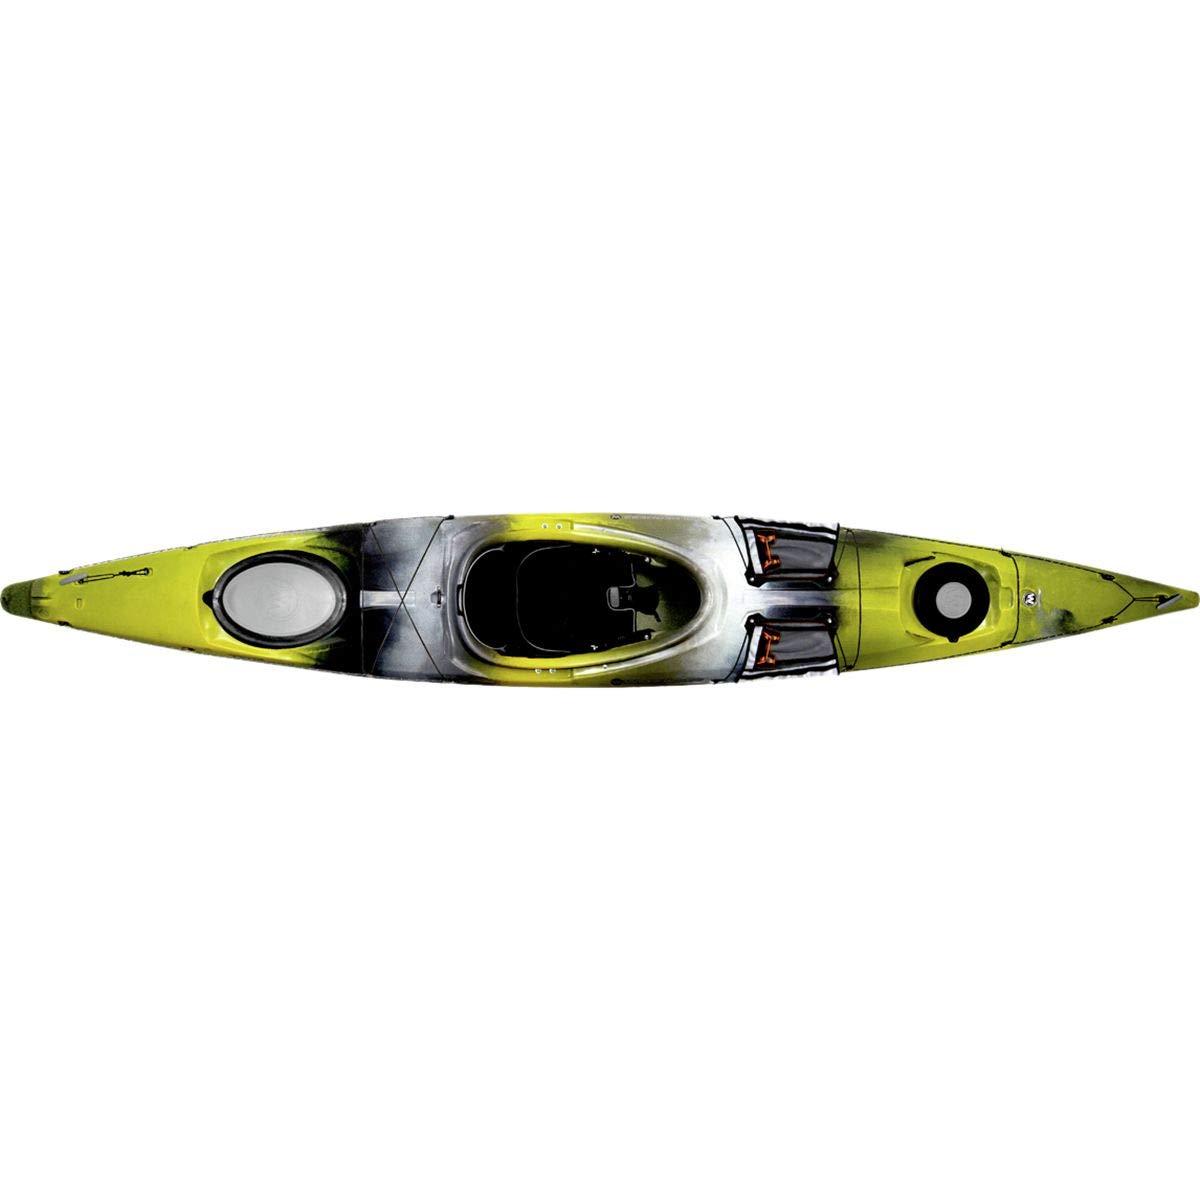 Wilderness Systems 9720468156 Tsunami 145 with Rudder Kayaks, Solar, 14'6''